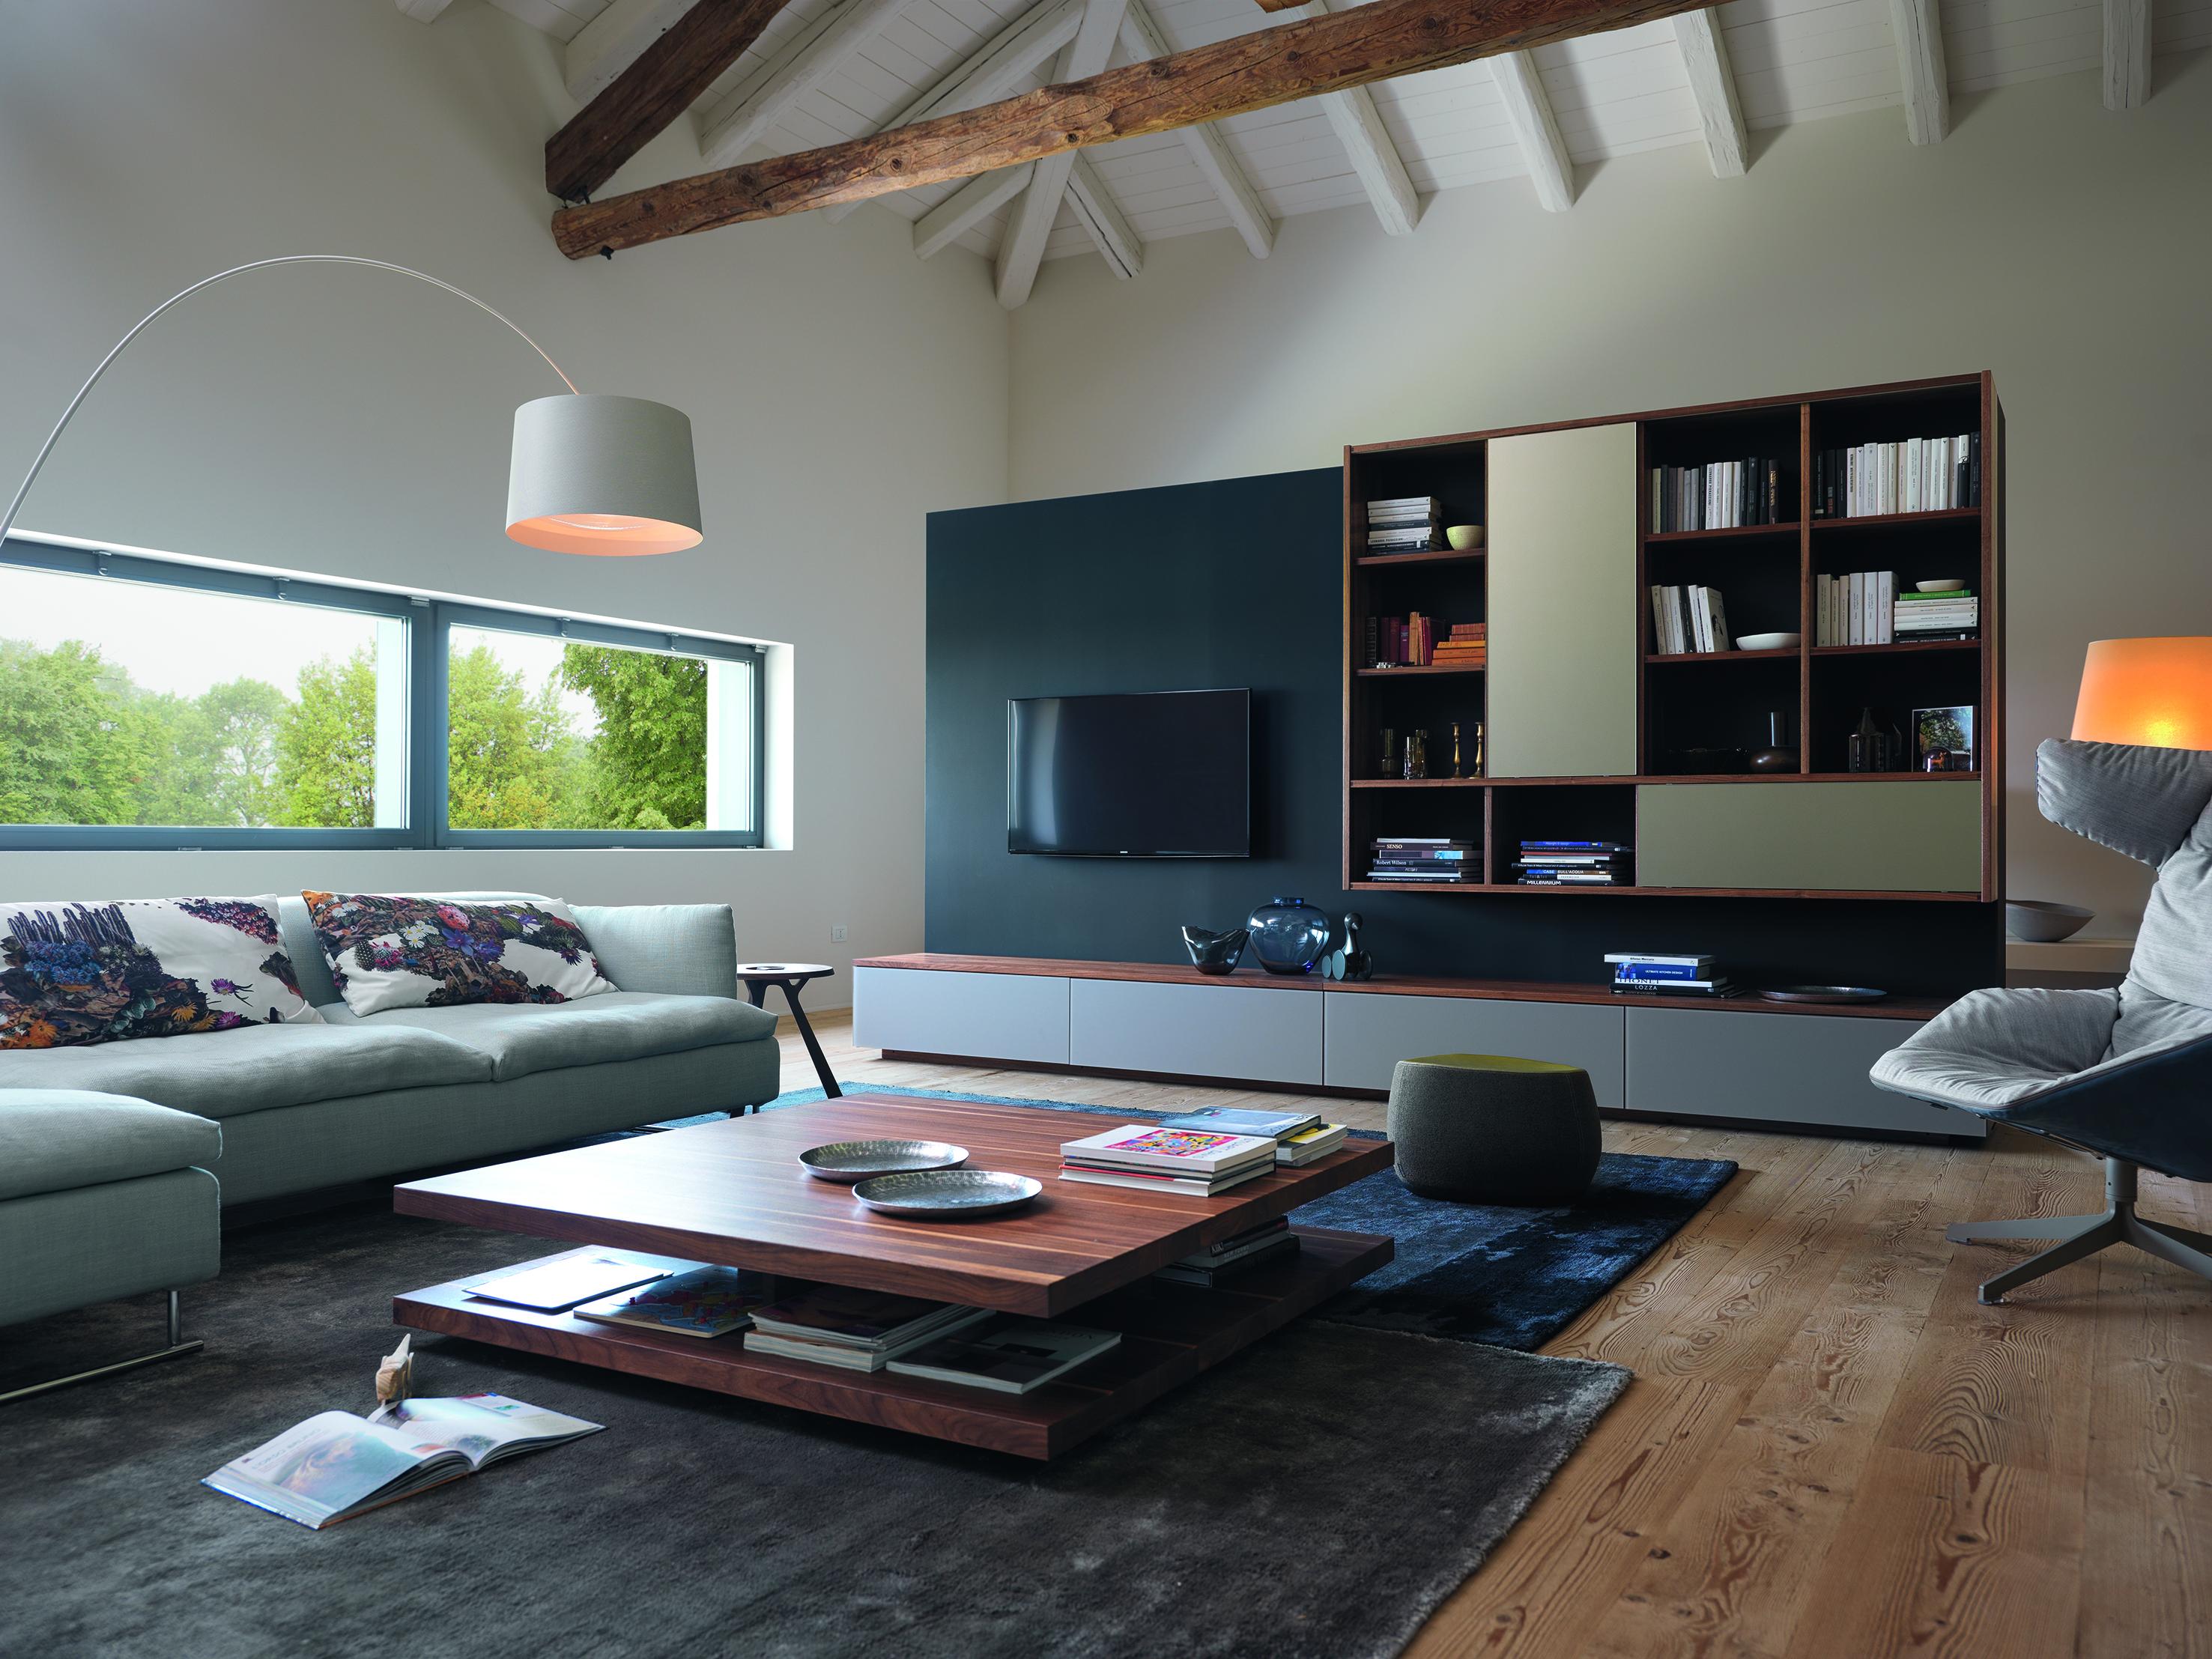 Home - Interior Gent